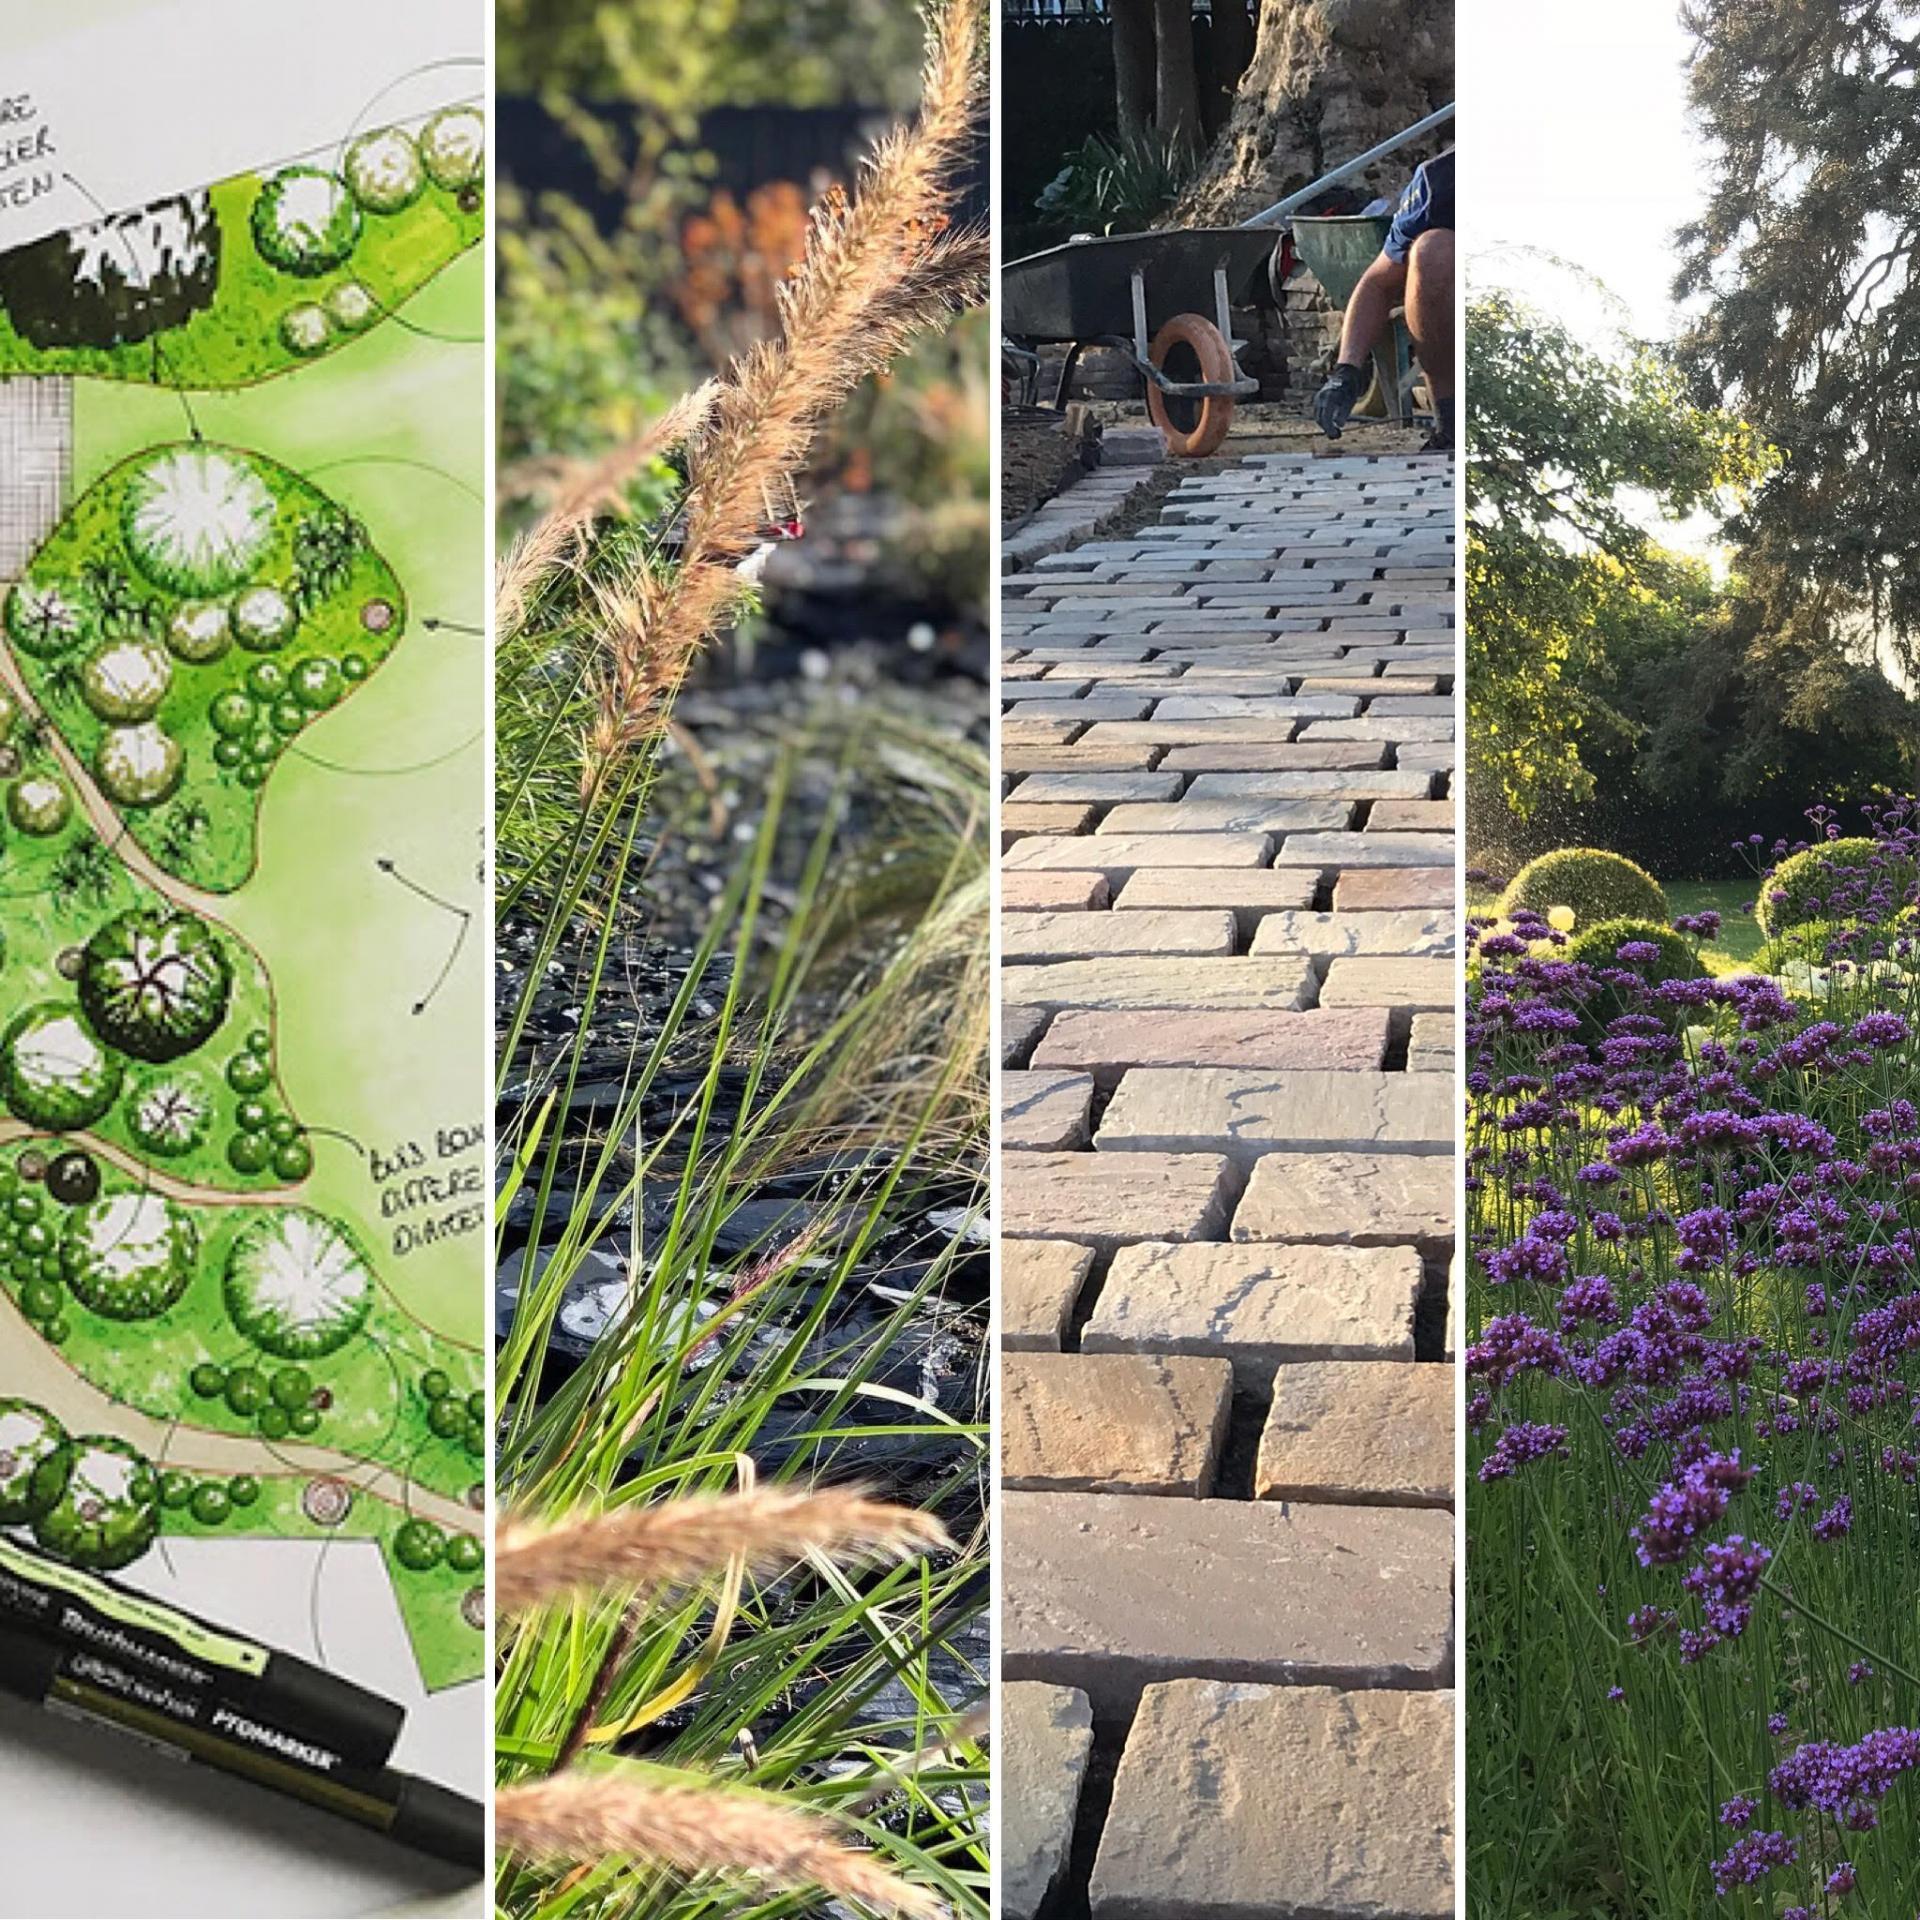 Paysagiste auxerre yonne 89 bourgogne philippe liperi jardin paysage creation amenagement entretien terrasse allees